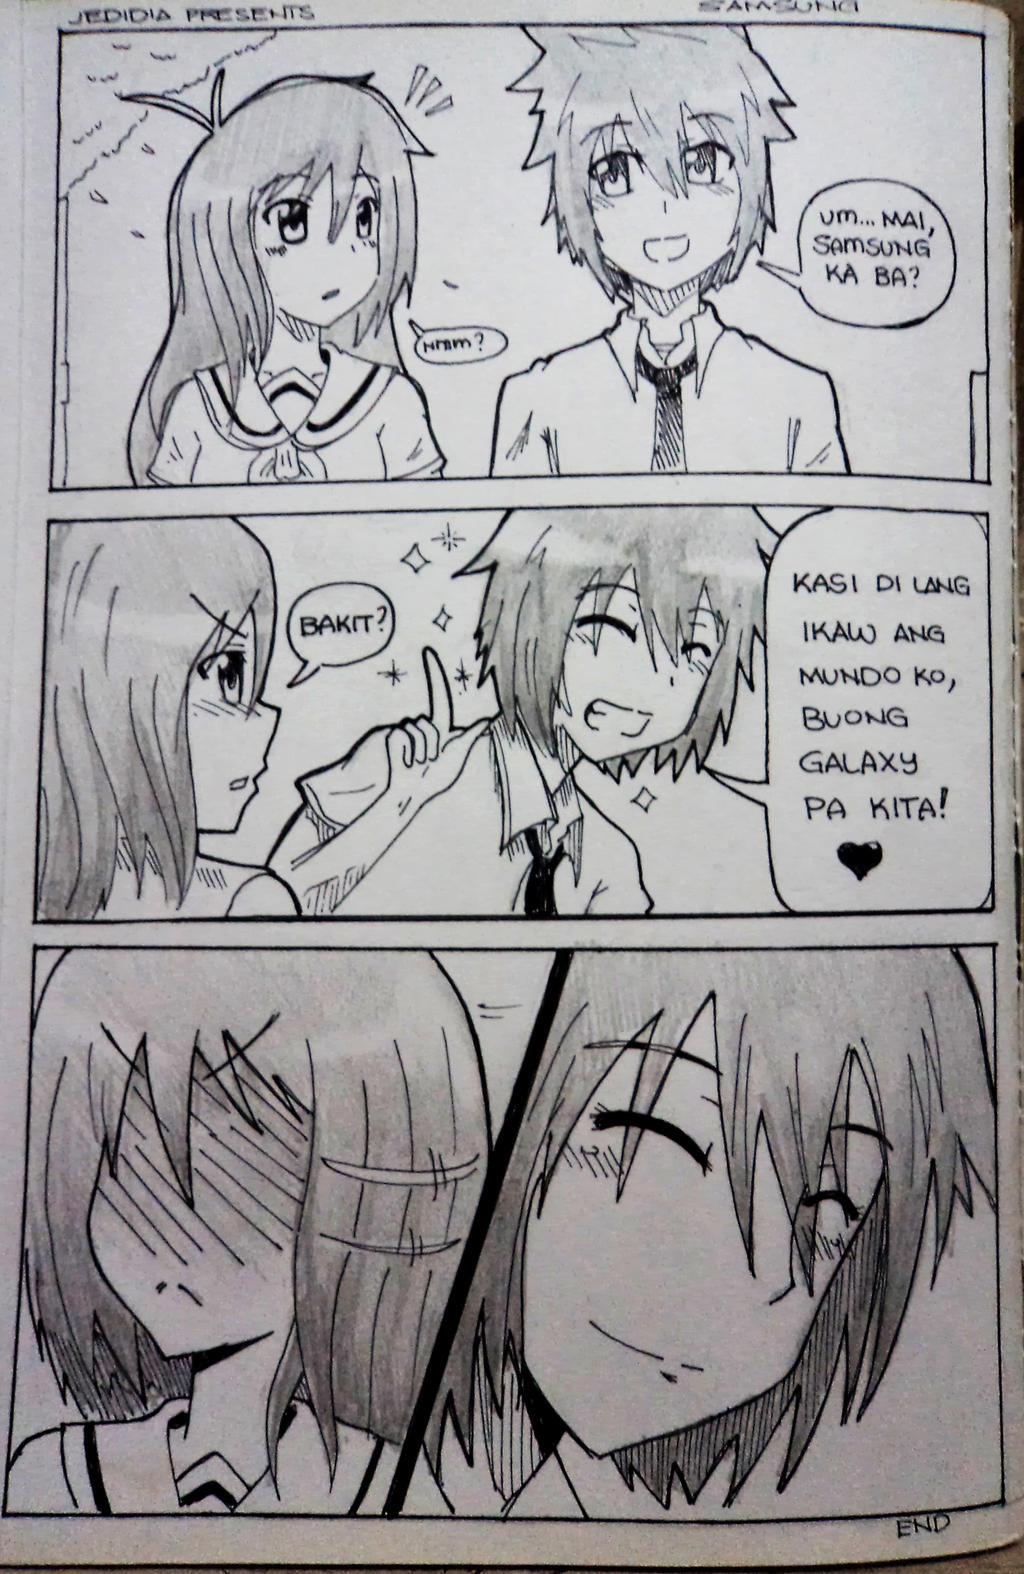 Manga comic strips online